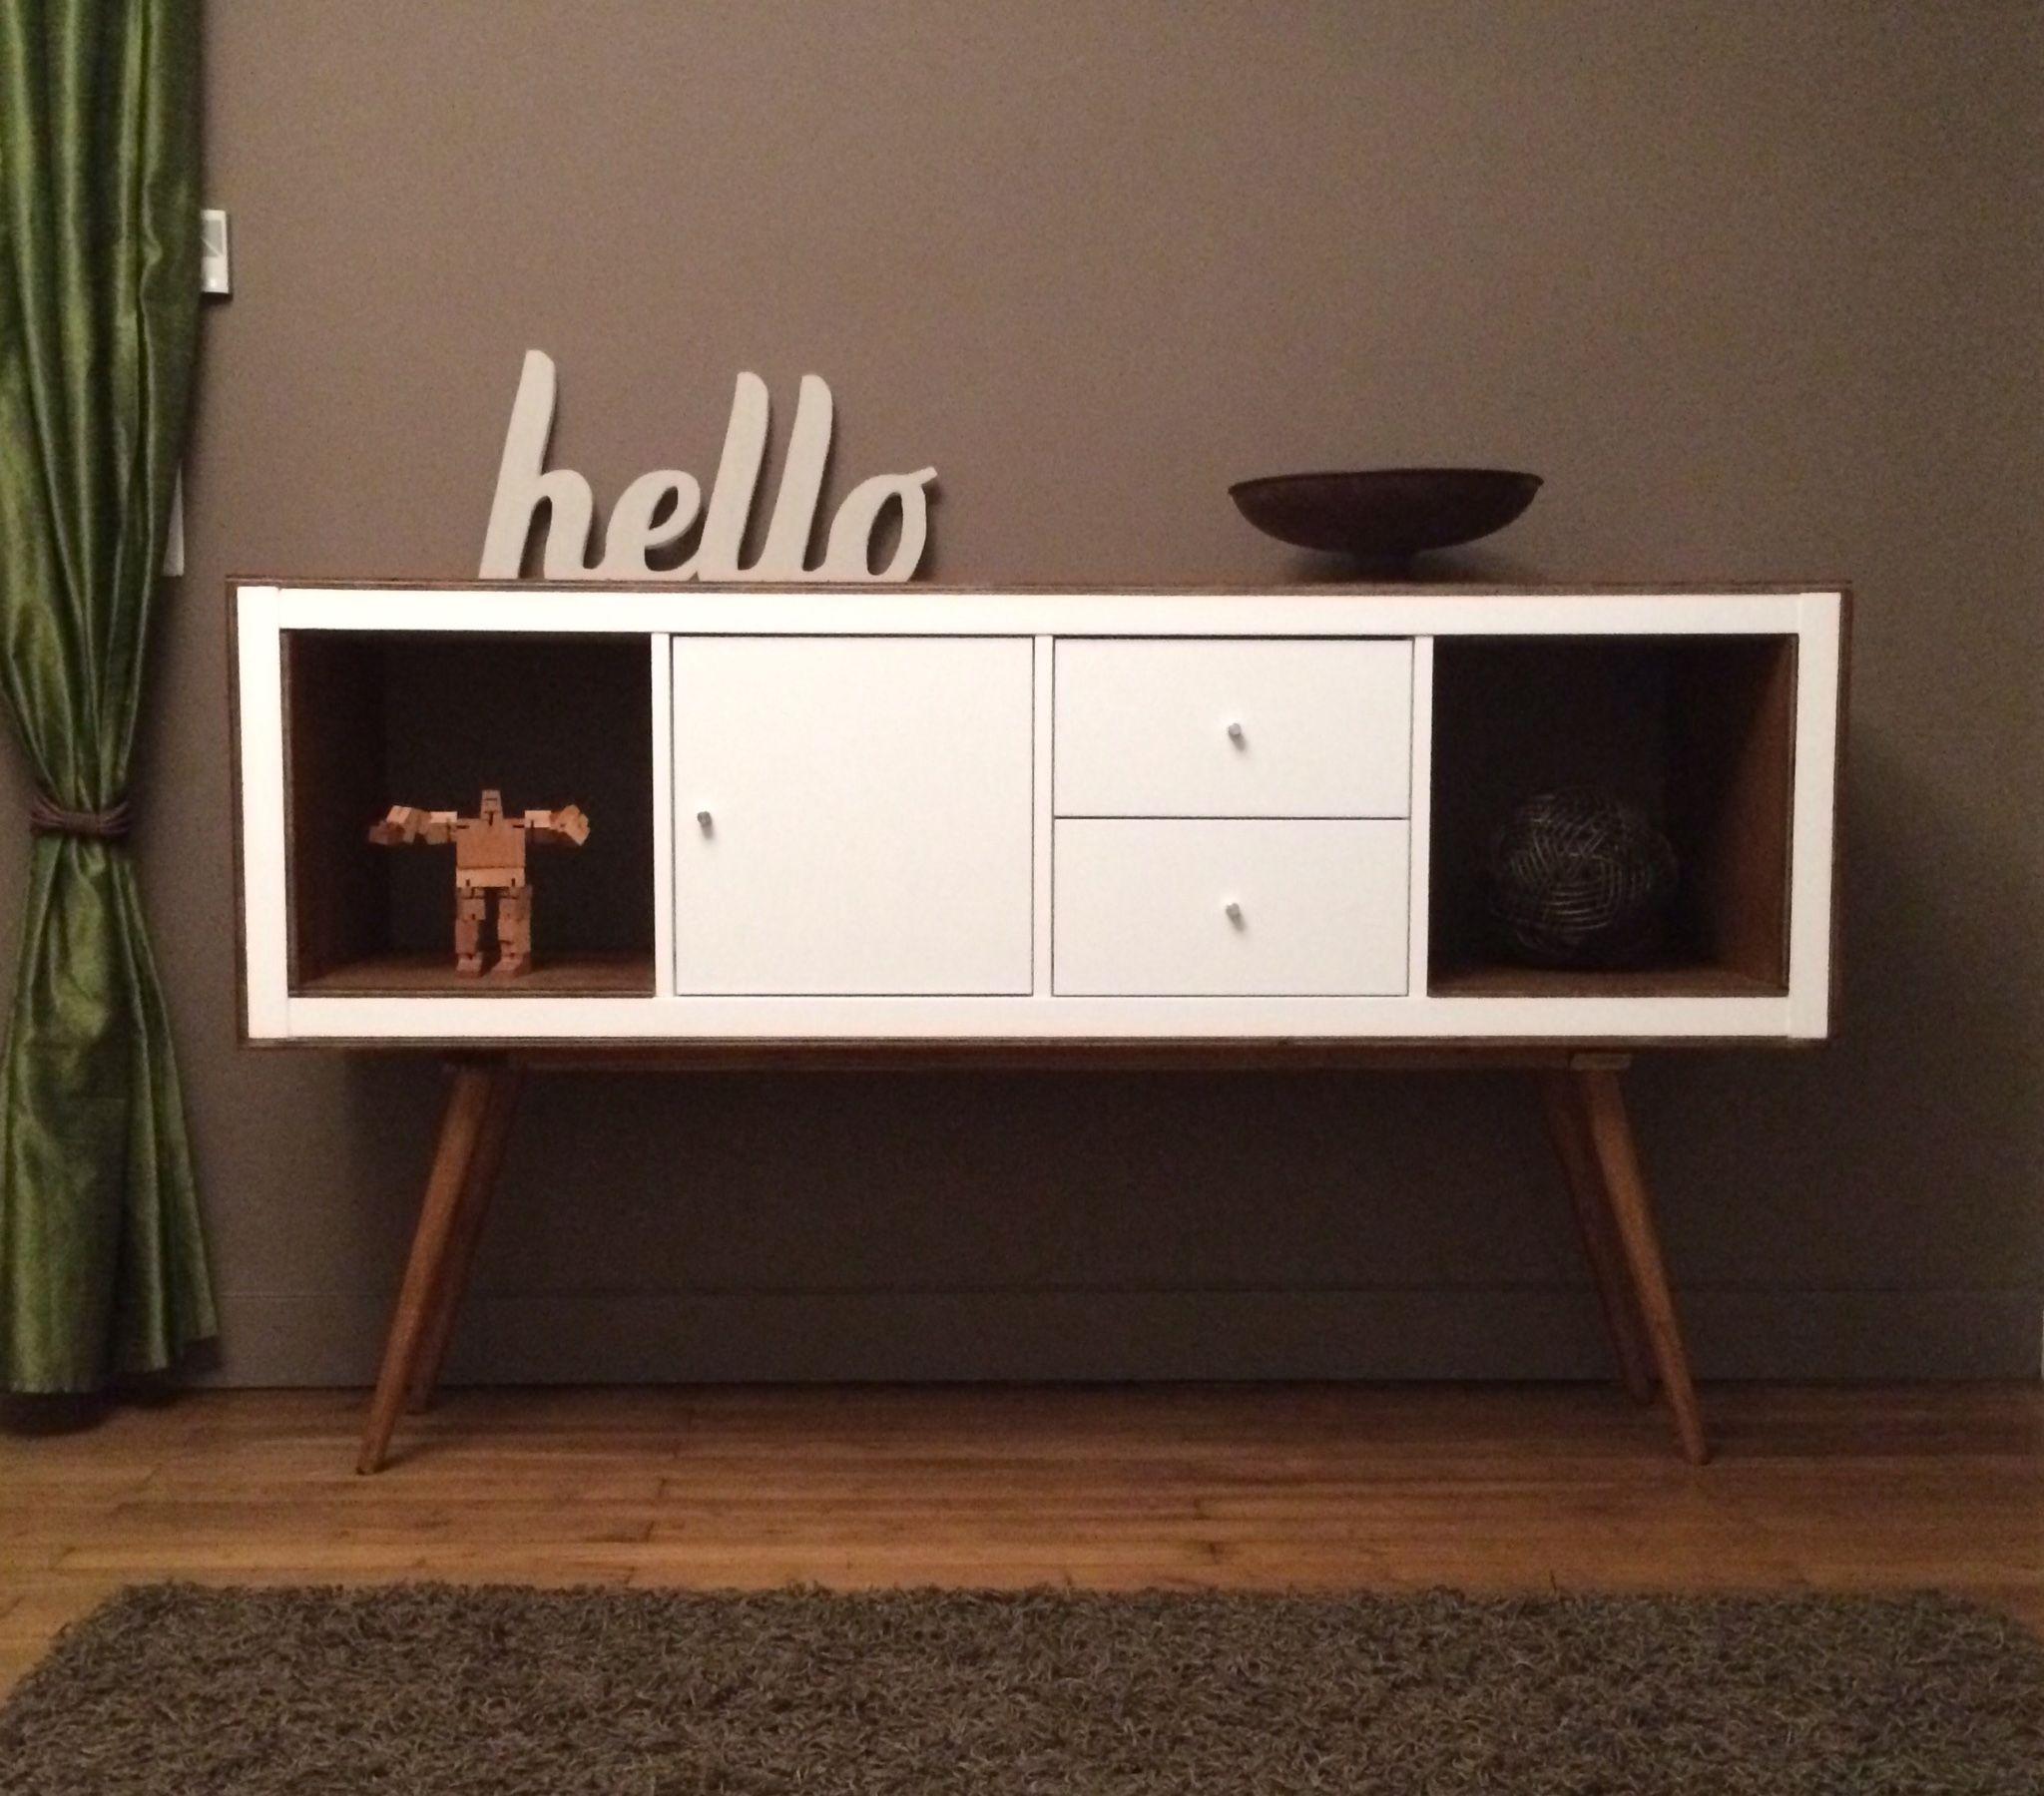 Ikea Kallax 10mm Ply Board Longer Legs And Kallax Doors And